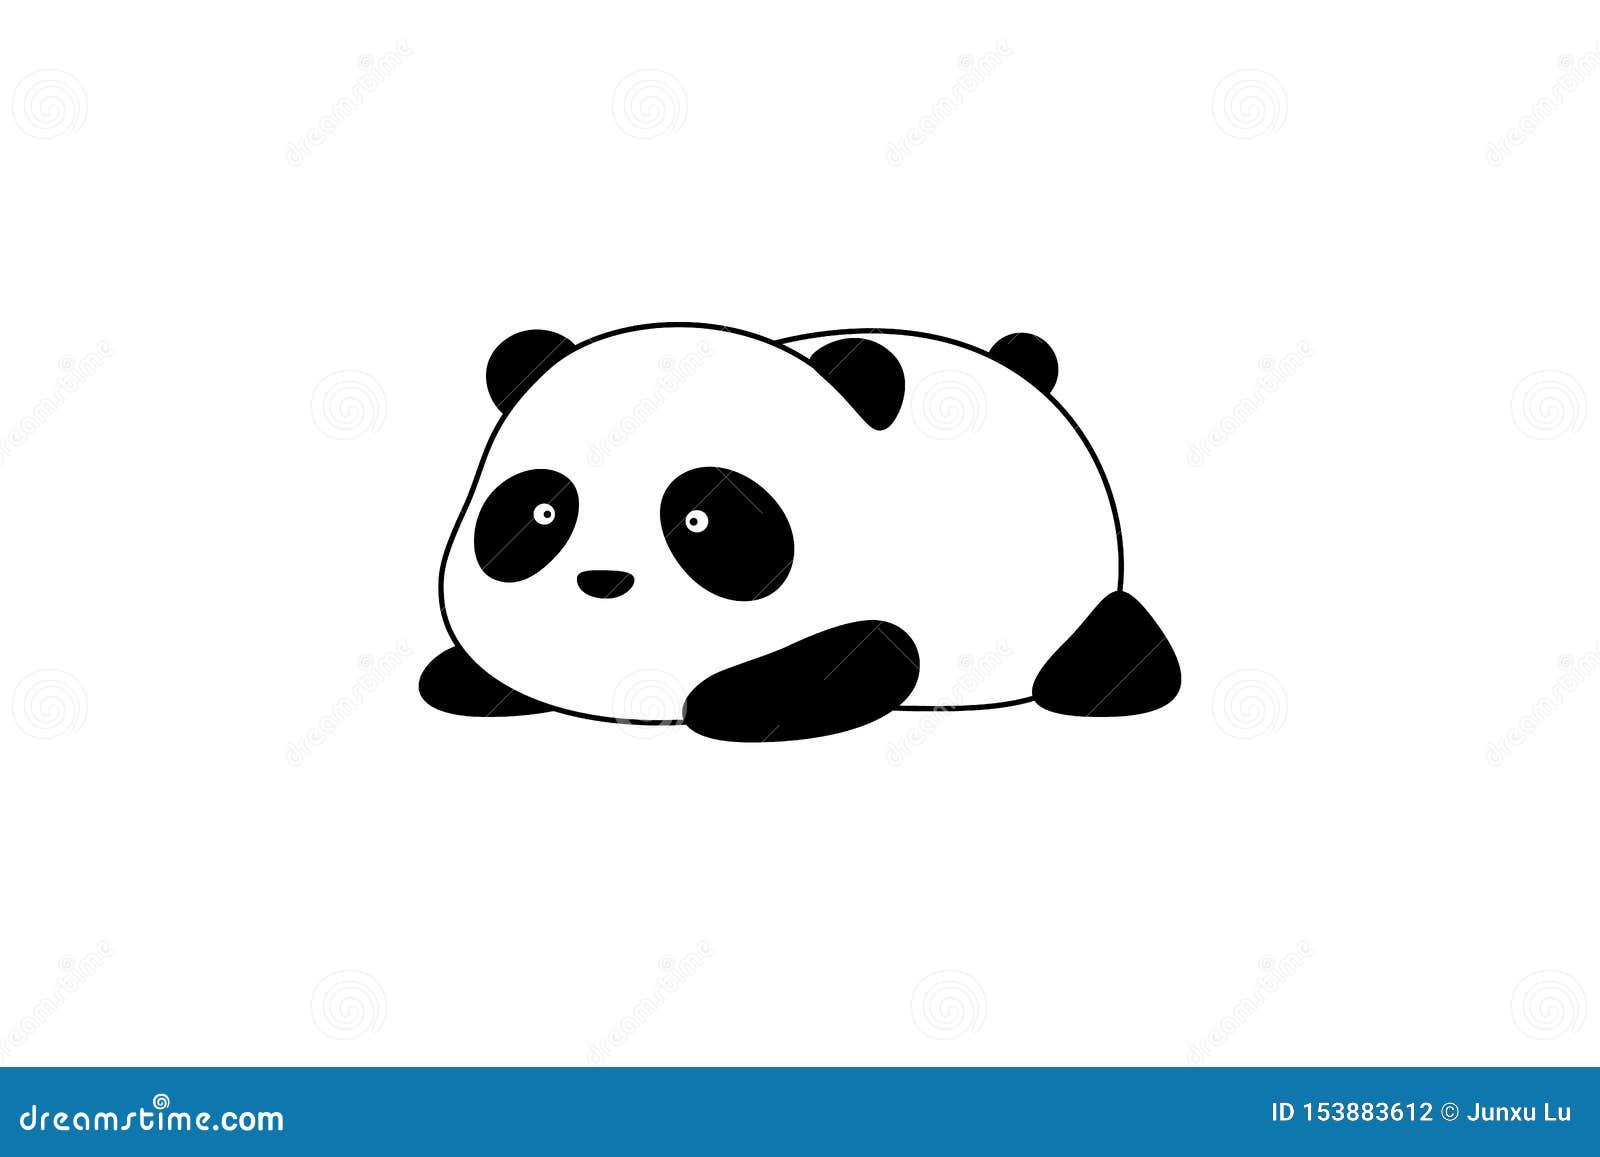 Lazy Panda Stock Illustrations 521 Lazy Panda Stock Illustrations Vectors Clipart Dreamstime